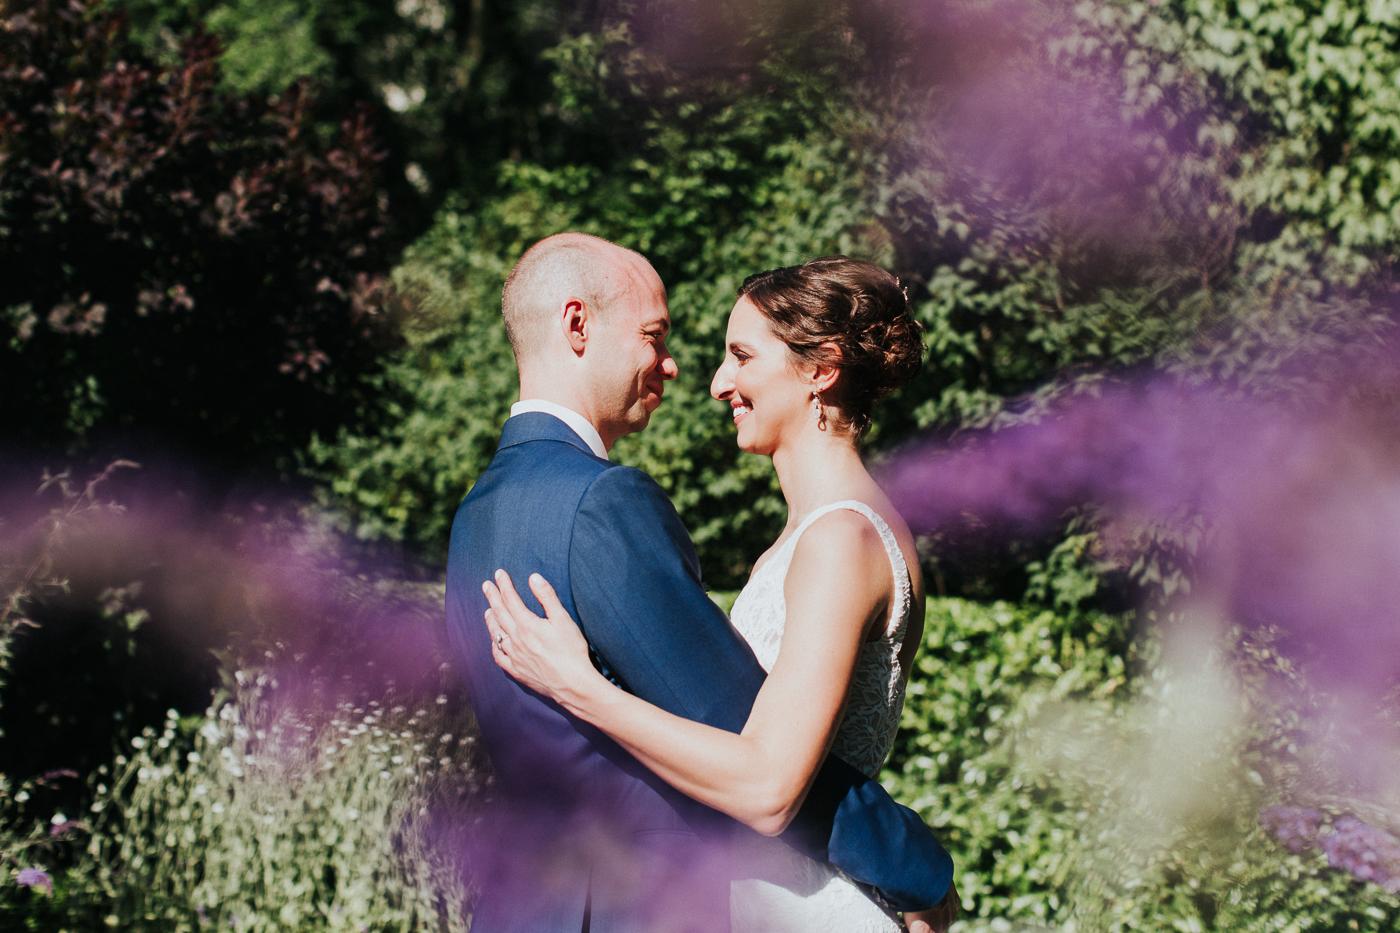 NYC-Central-Park-Conservatory-Garden-Intimate-Elopement-Documentary-Wedding-Photographer-41.jpg